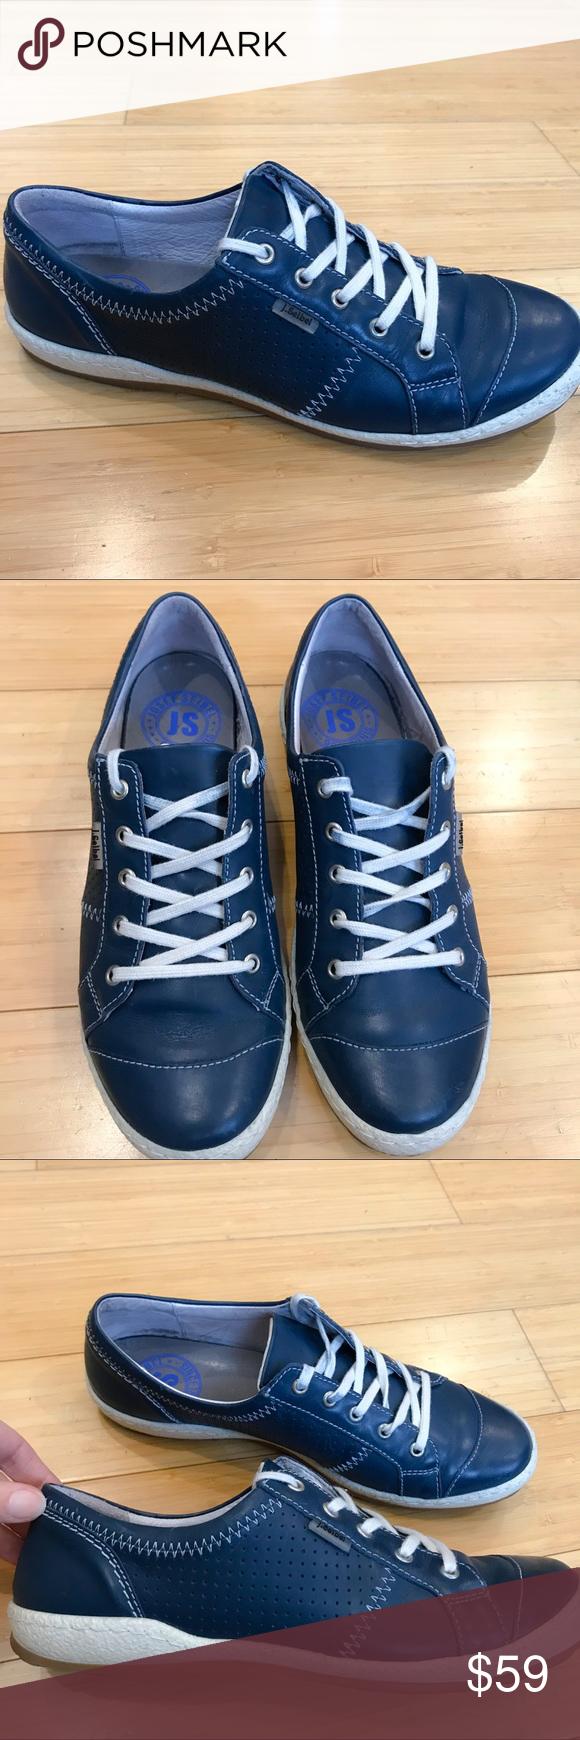 JOSEPH SEIBEL Caspian blue sneakers, 40